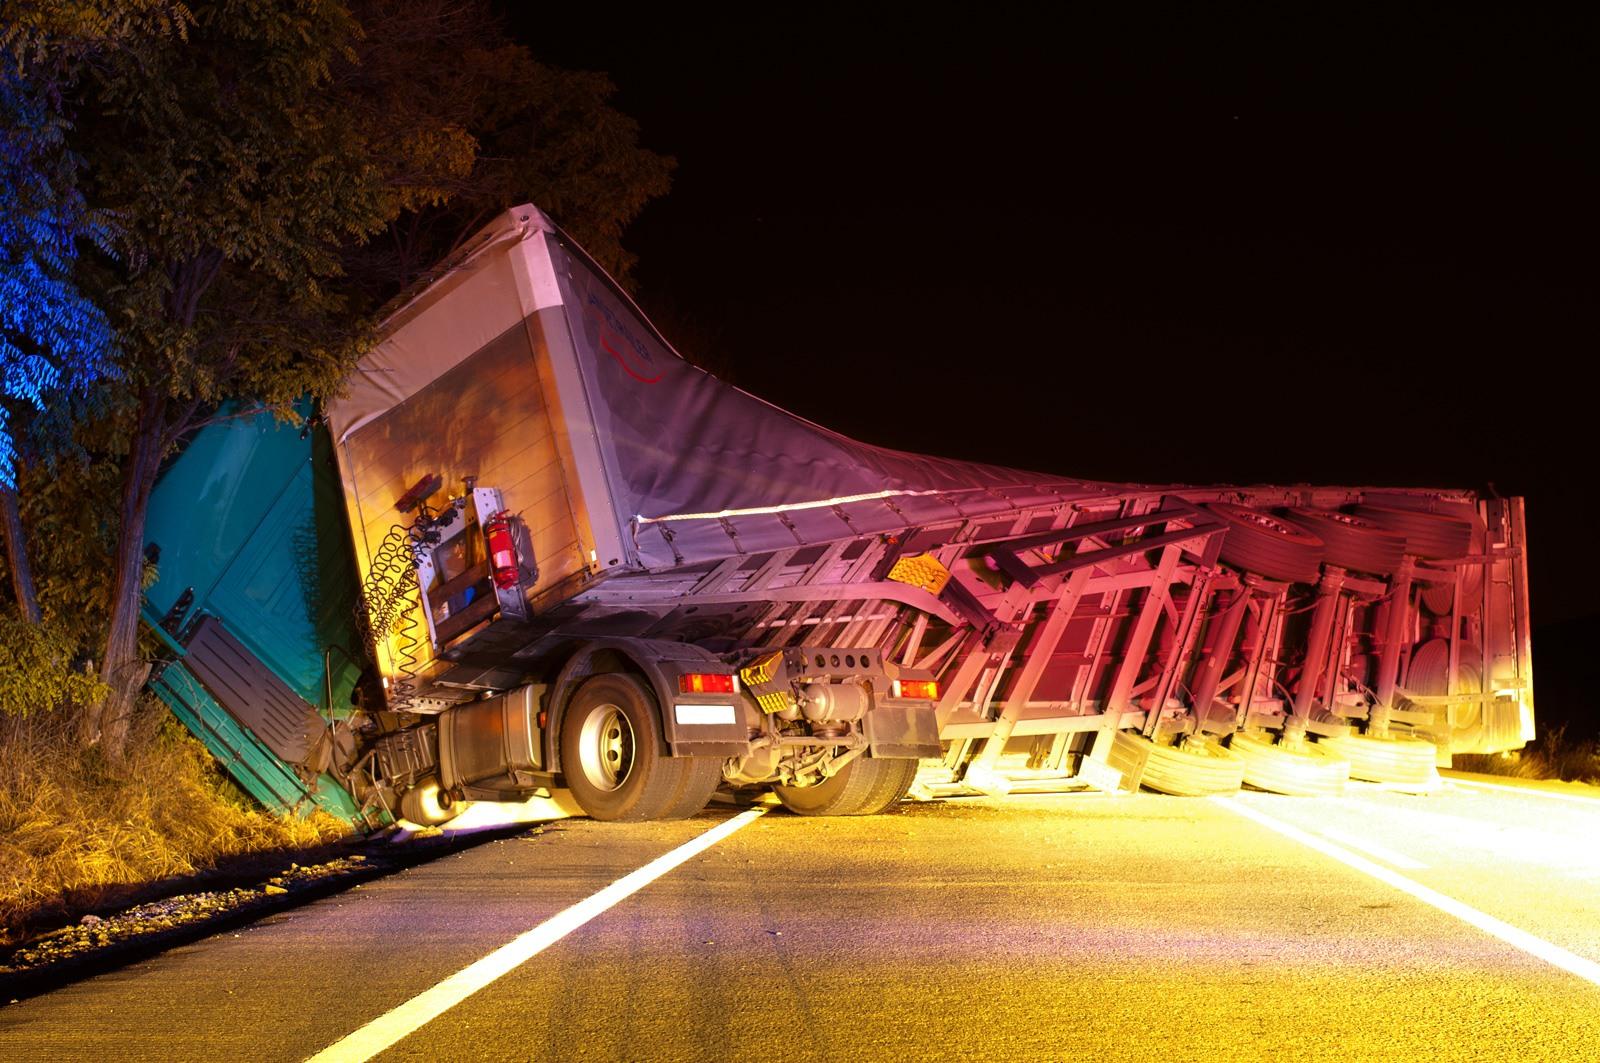 Tractor Trailer Accident Attorneys Bear DE | Delaware's injury lawyer